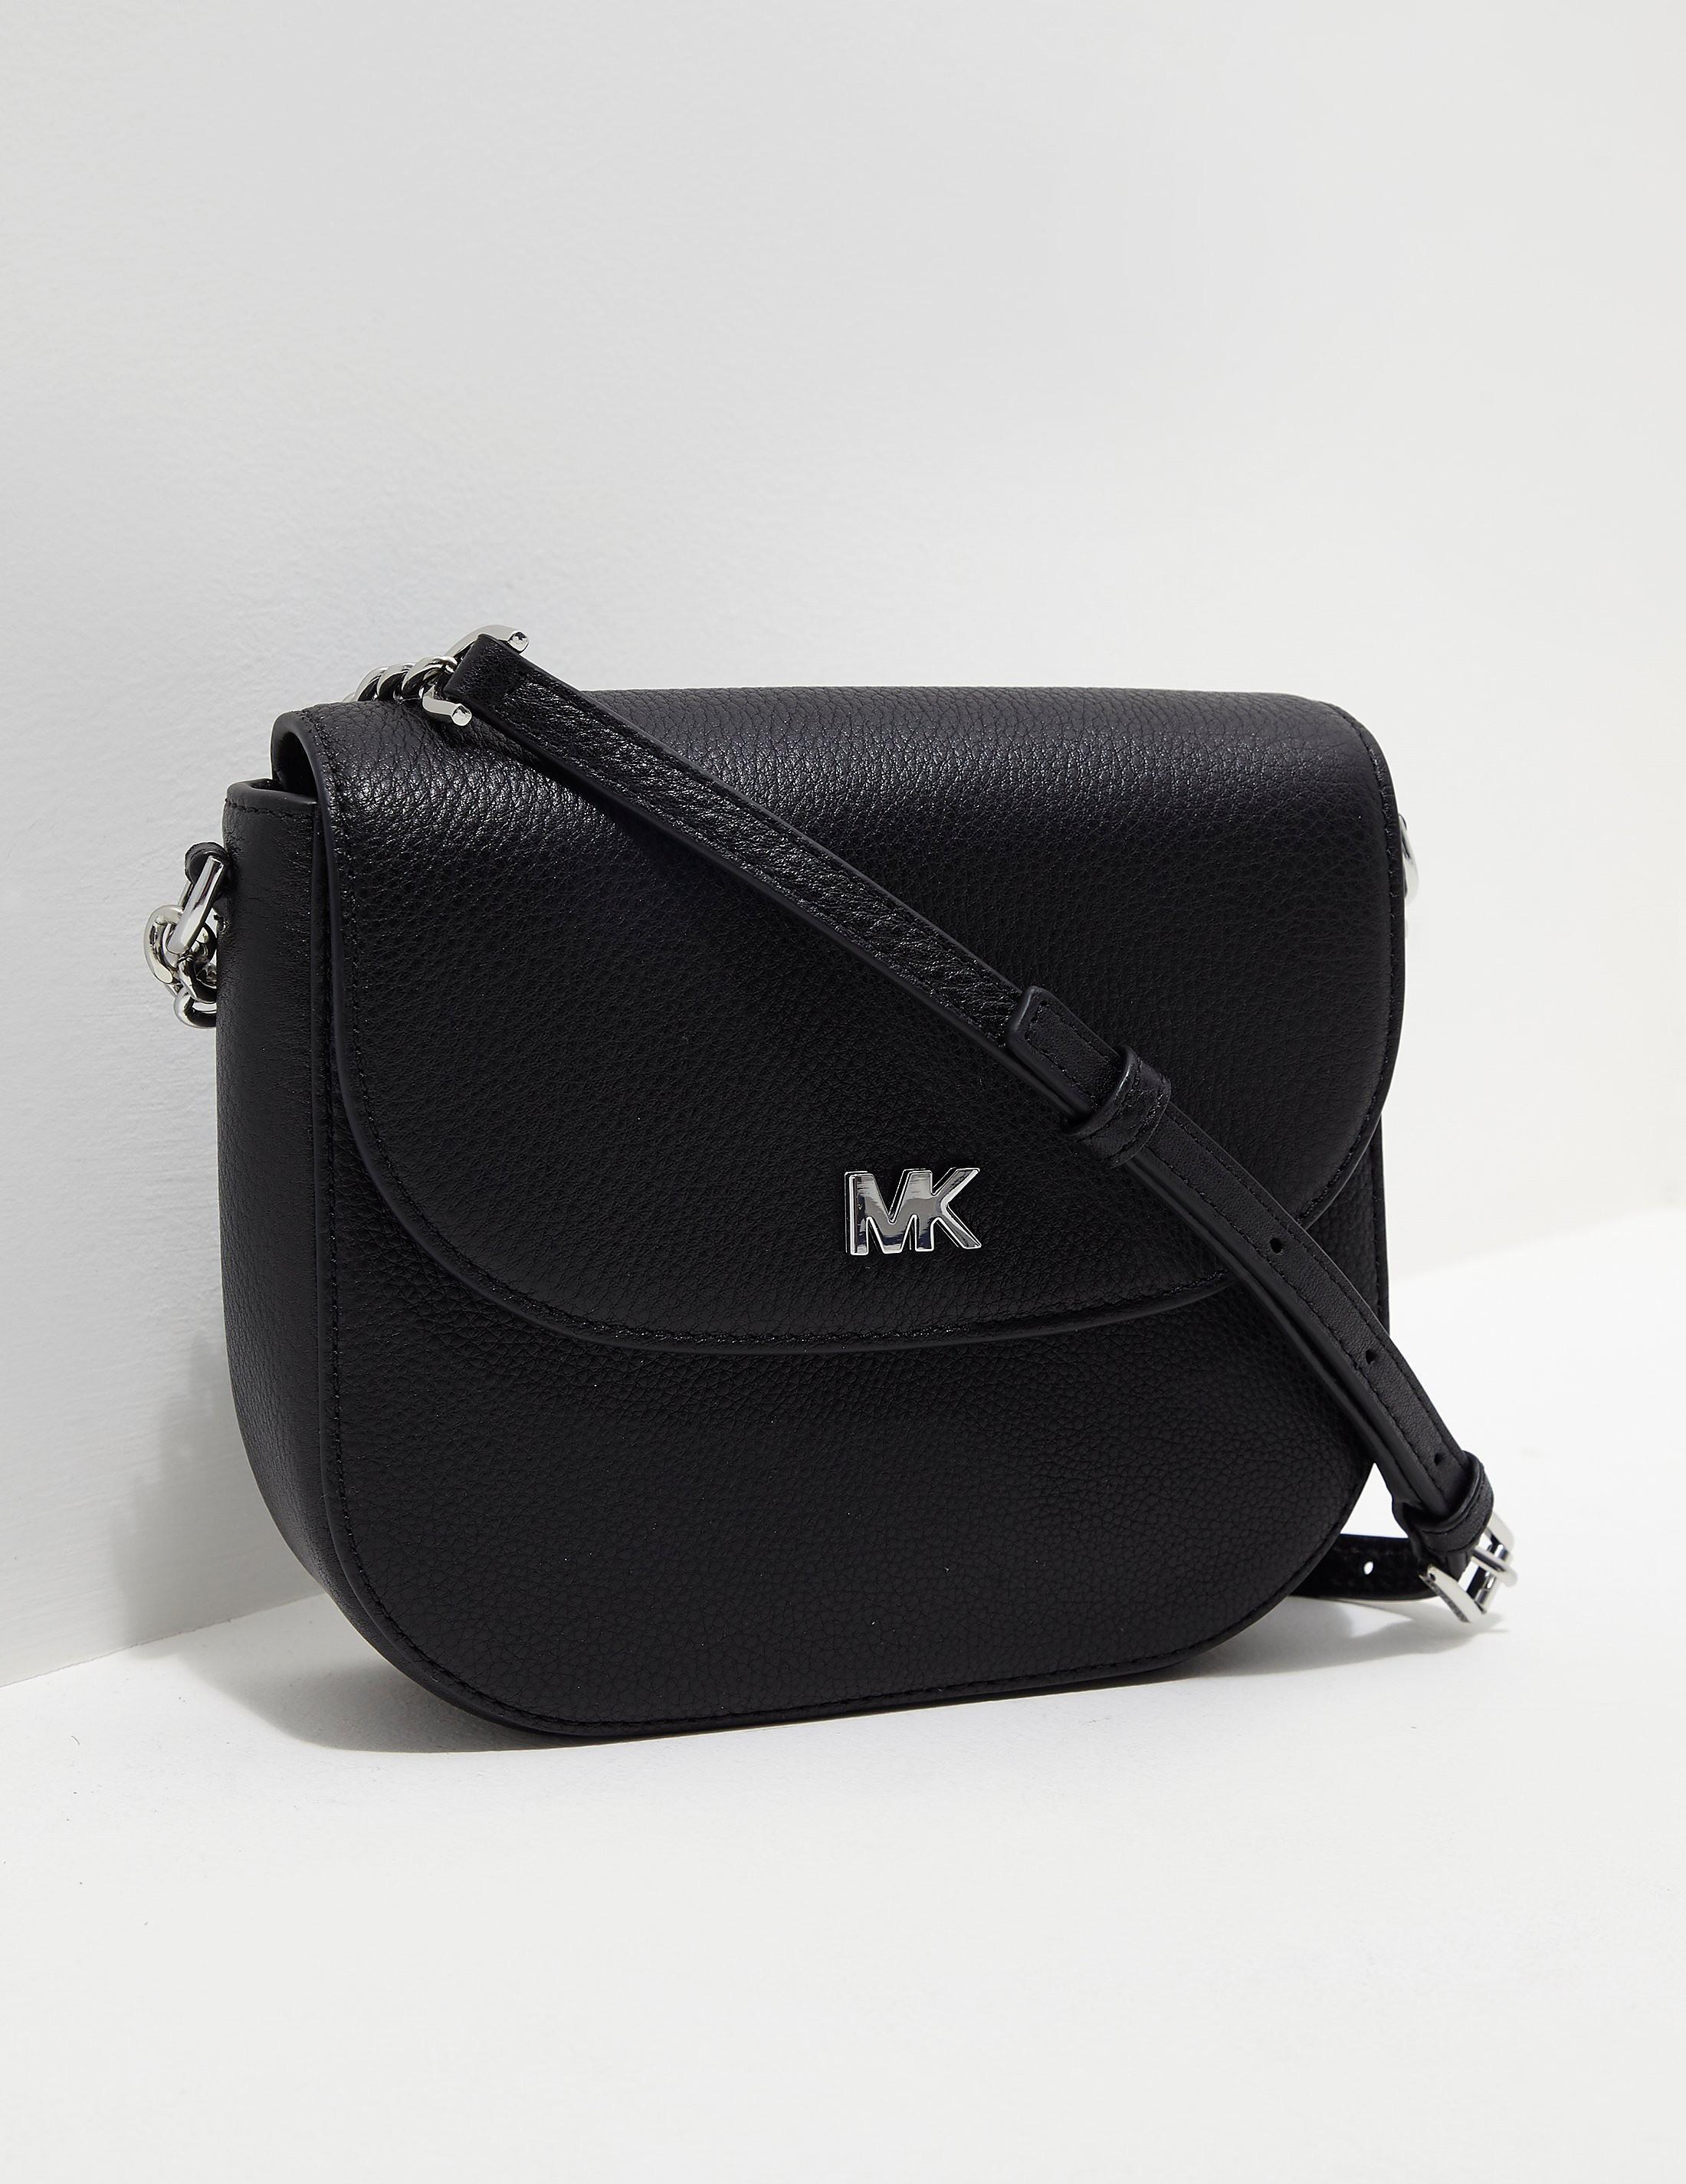 Michael Kors Half Dome Shoulder Bag